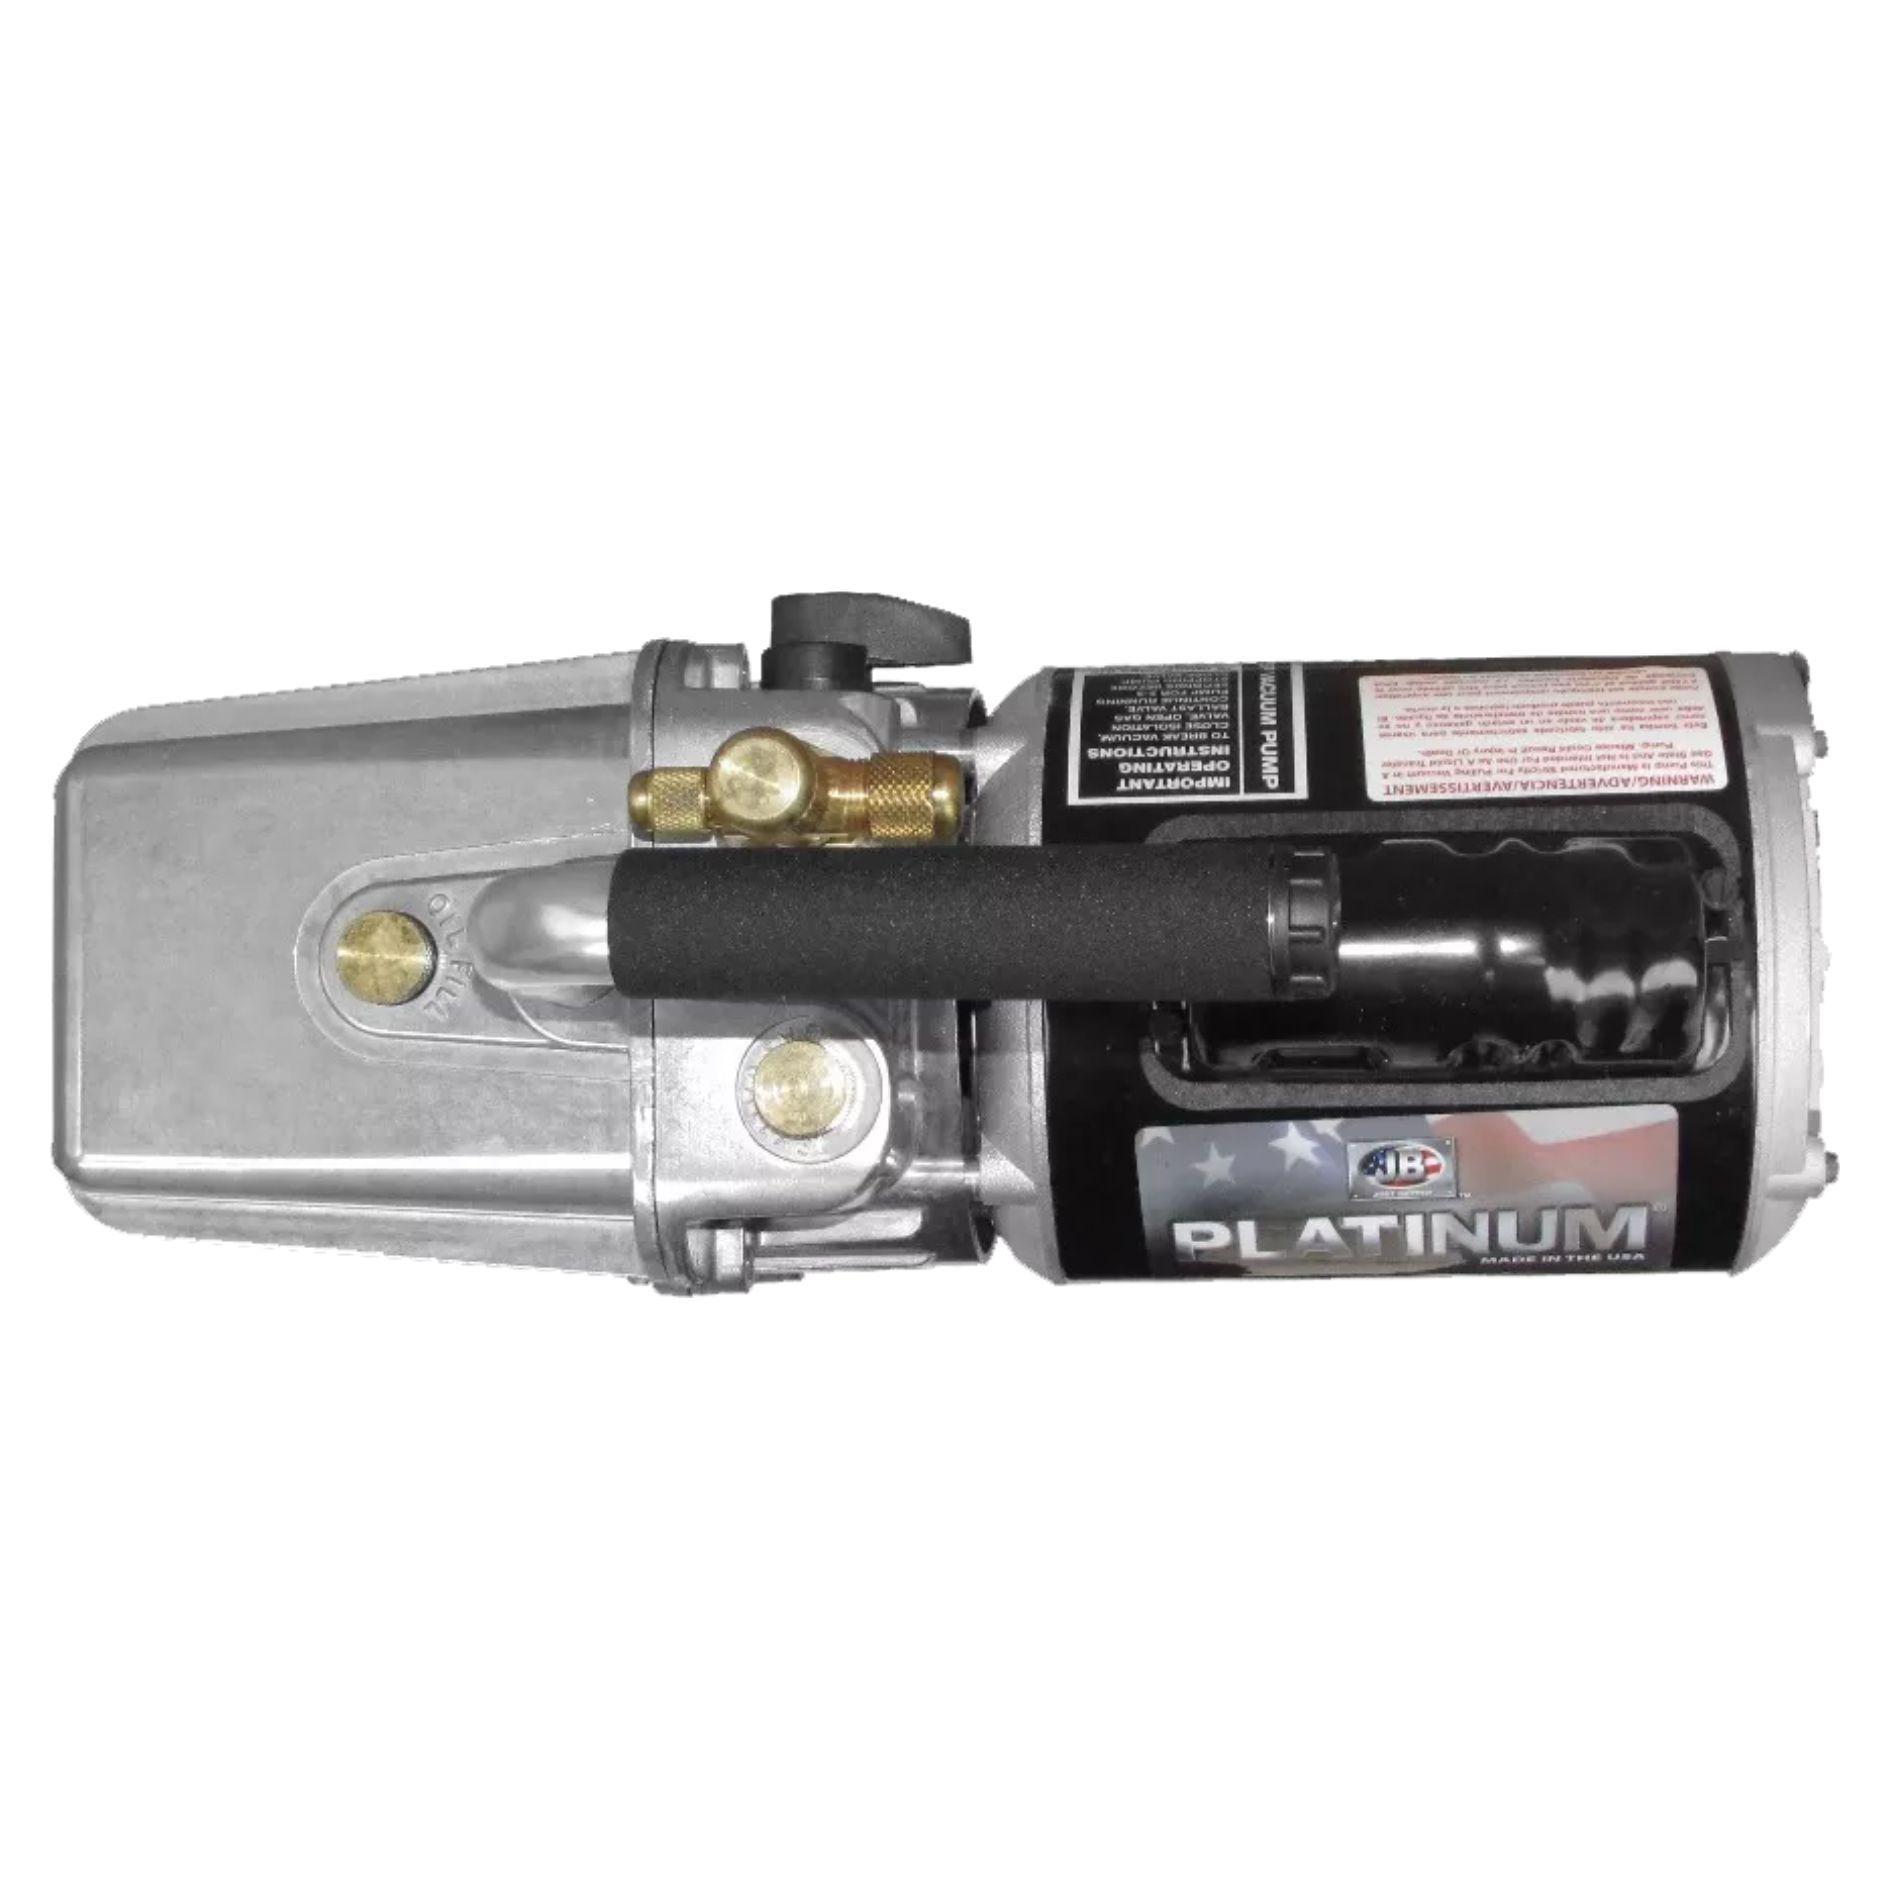 Bomba De Vácuo JB DV 142N 250 PLATINUM 5Cfm 2 Estágios Bivolt